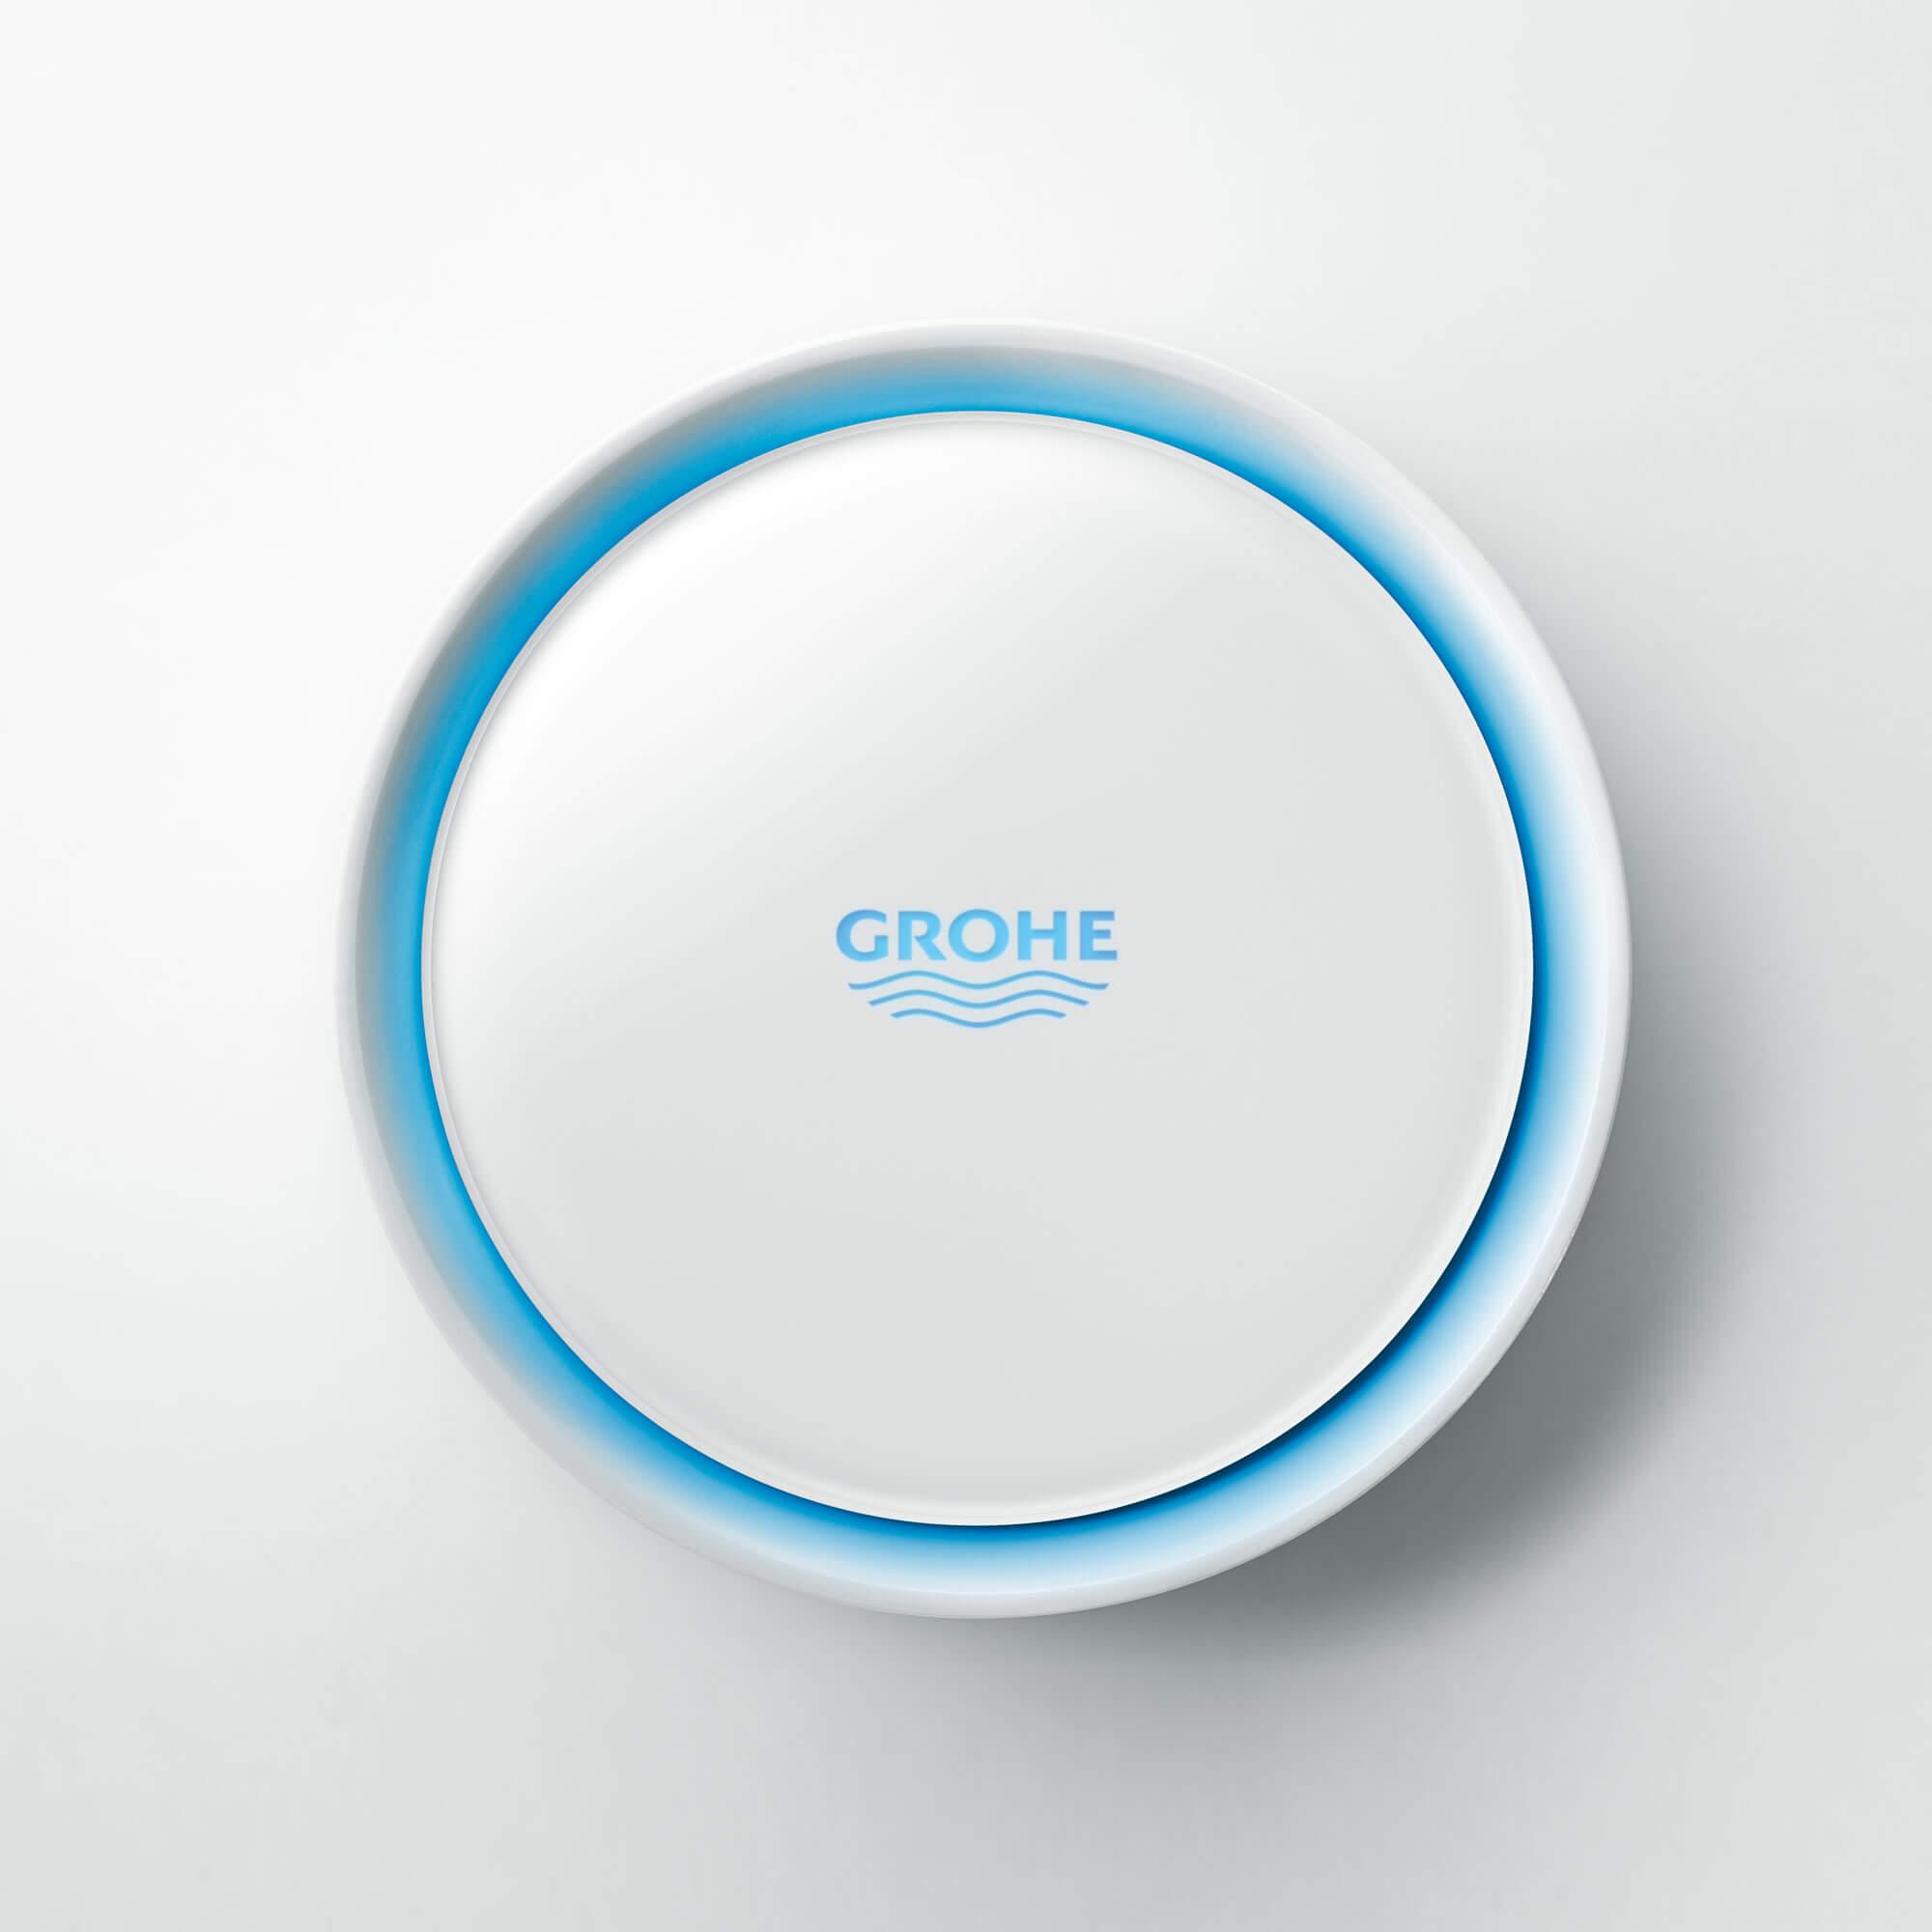 GROHE Innovations - GROHE Sense Smart Water Sensor